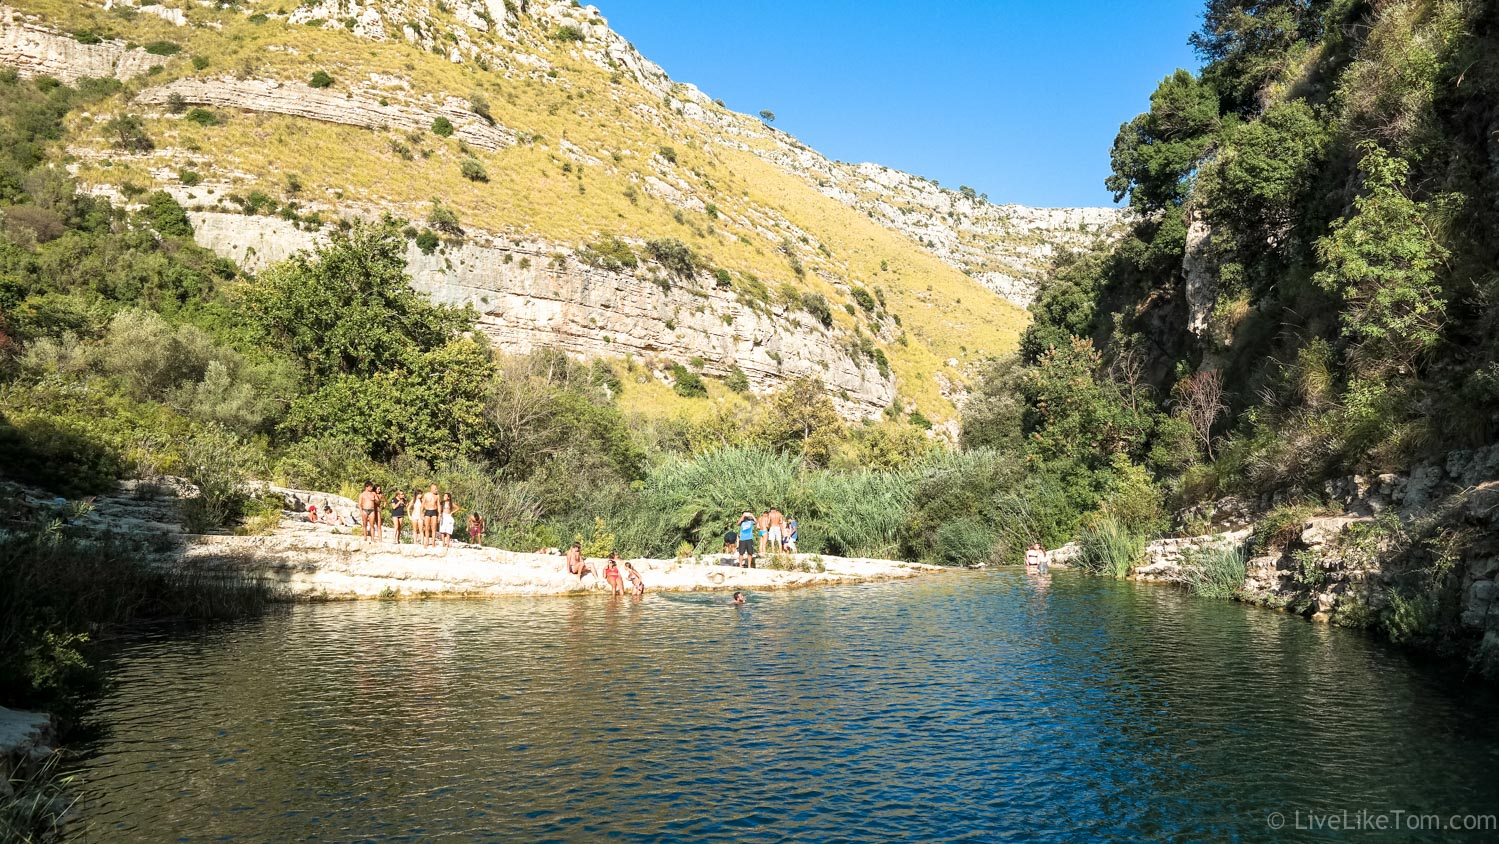 wandelen zwemmen duiken vakantie Sicilië gay Sicily